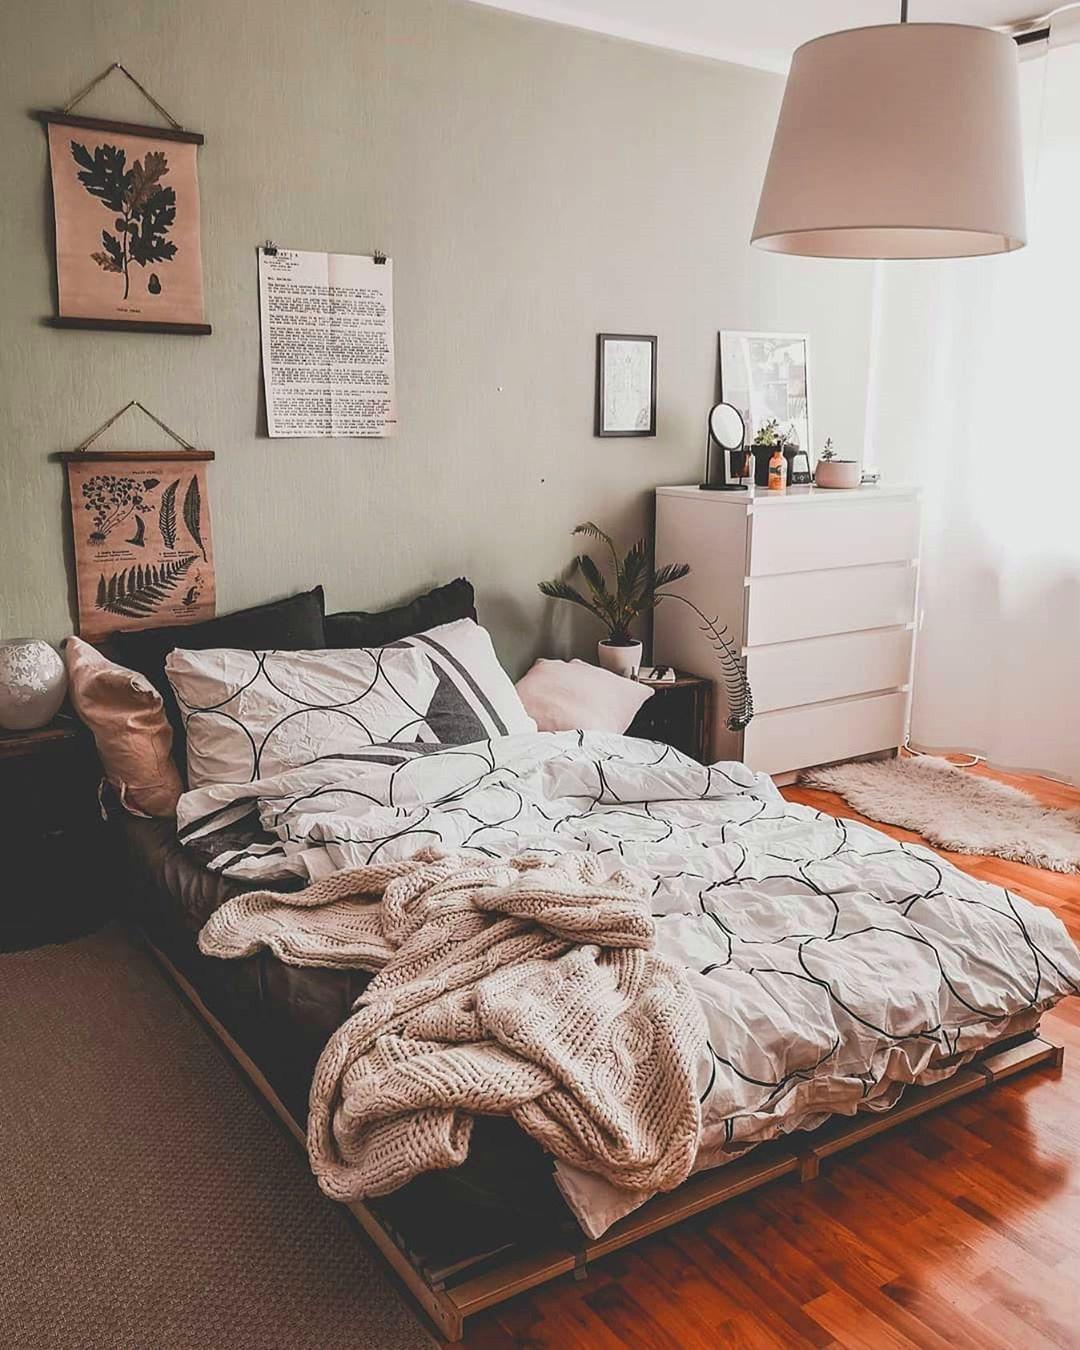 58 Inspiring Modern Bedroom Design Ideas Luxury Bedroom Inspiration Home Decor Bedroom Design Bedroom decor essential ideas